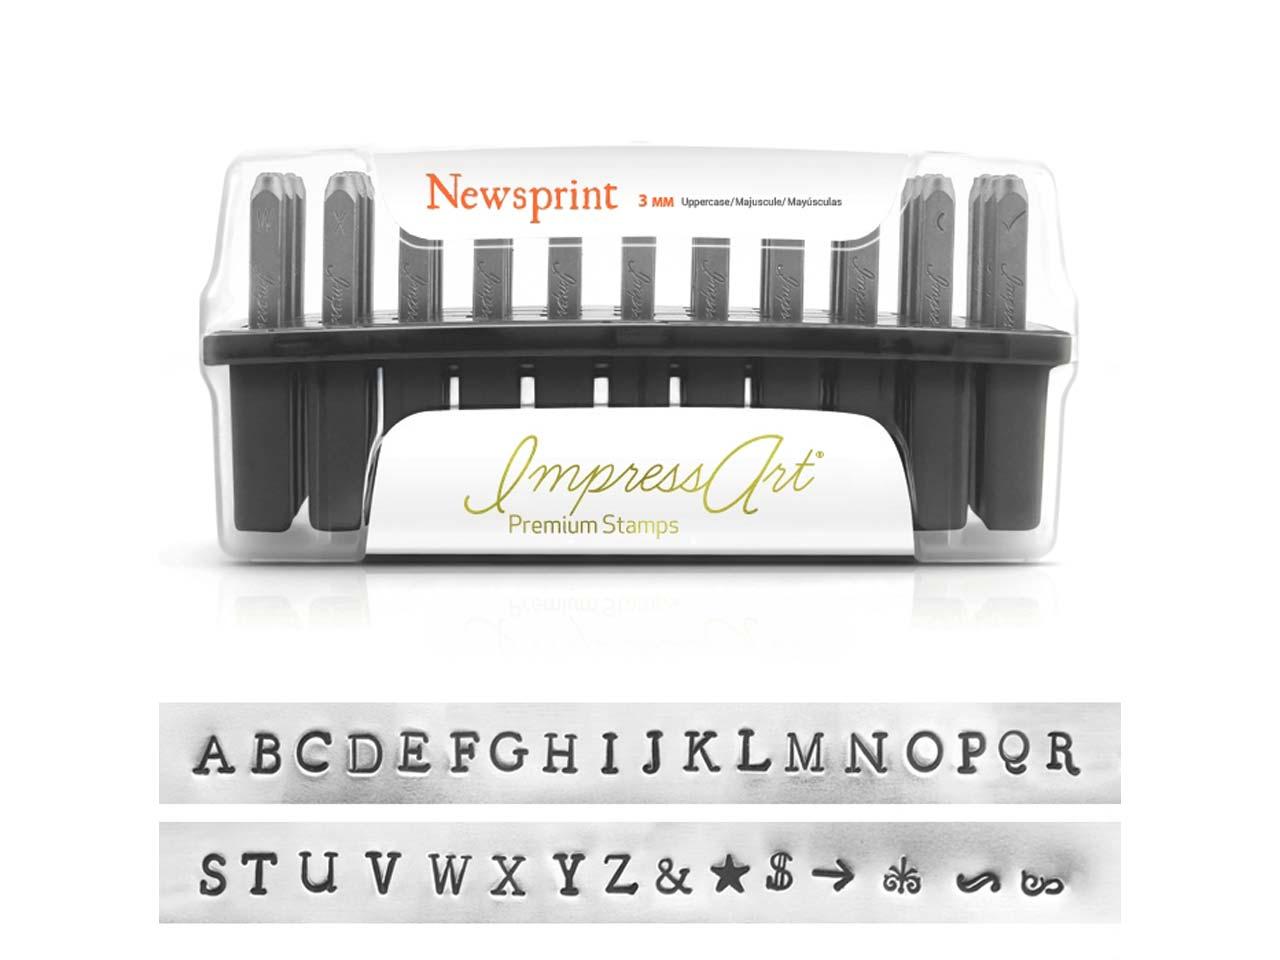 Impressart Premium Newsprint Numbers Metal Stamps Impressart Metal Stamps Buy One Give One